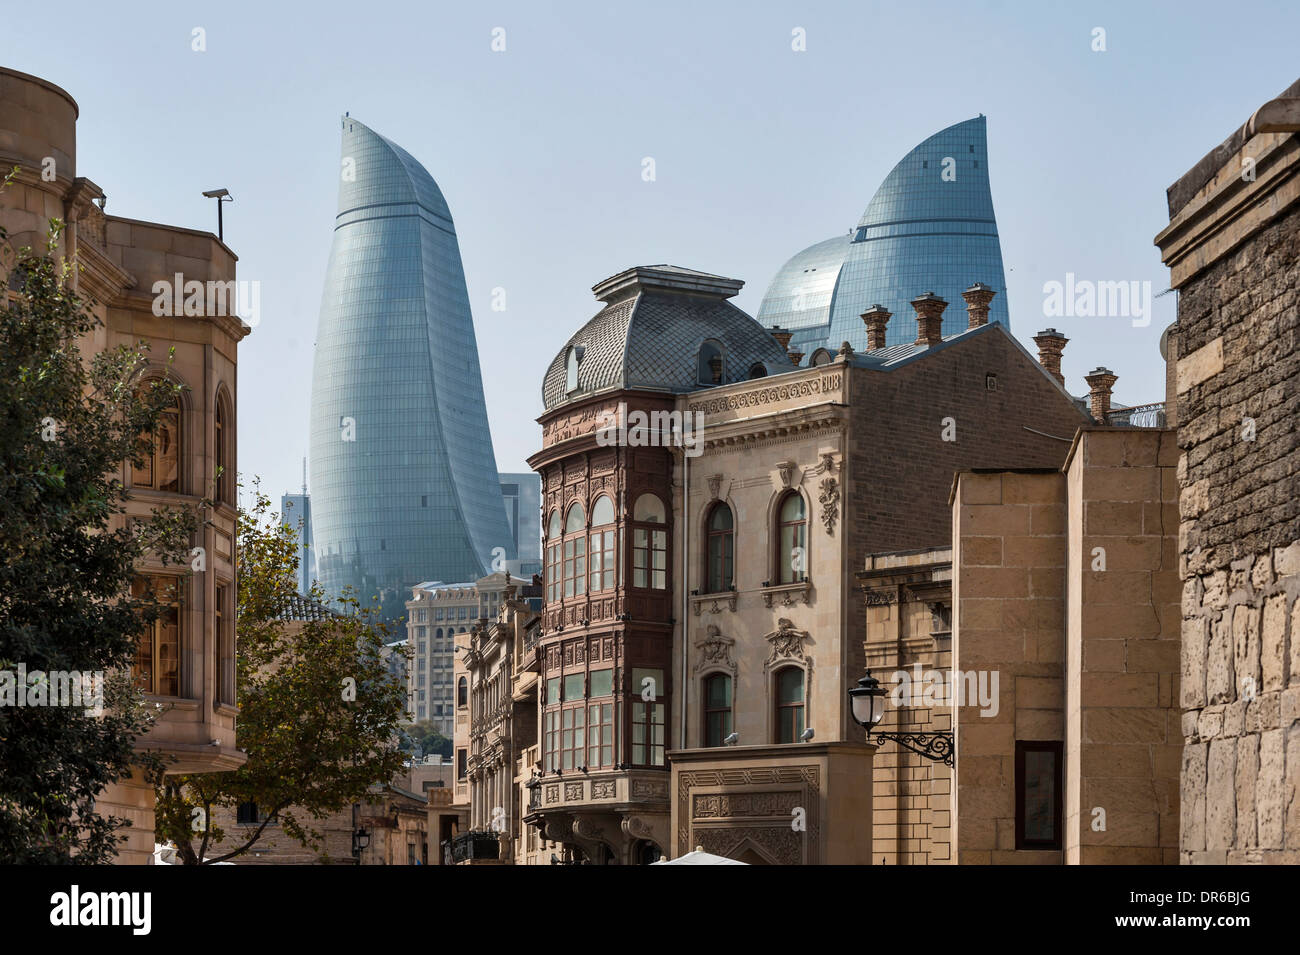 City scene old and modern architecture Baku Azerbaijan Stock Photo